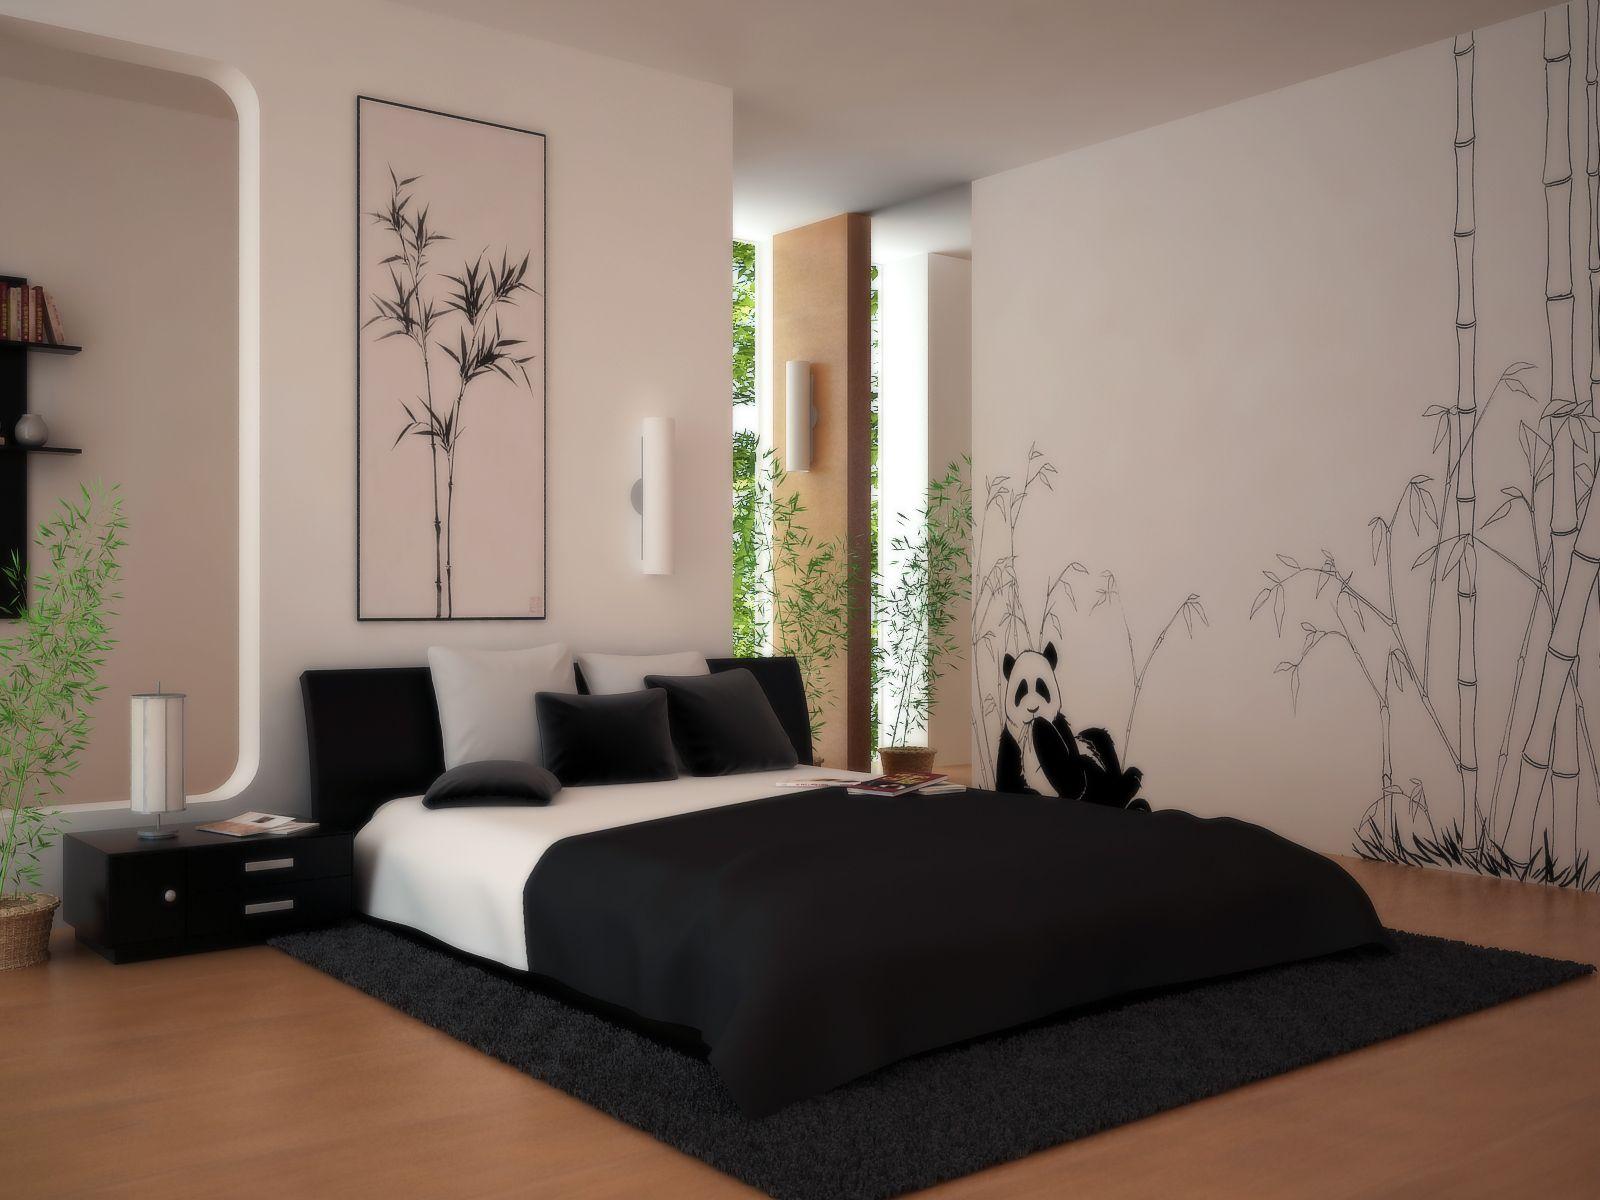 Easy Bedroom Ideas Wallpaper Decoration Easy Bedroom Decorating Ideas In  Stylish Way